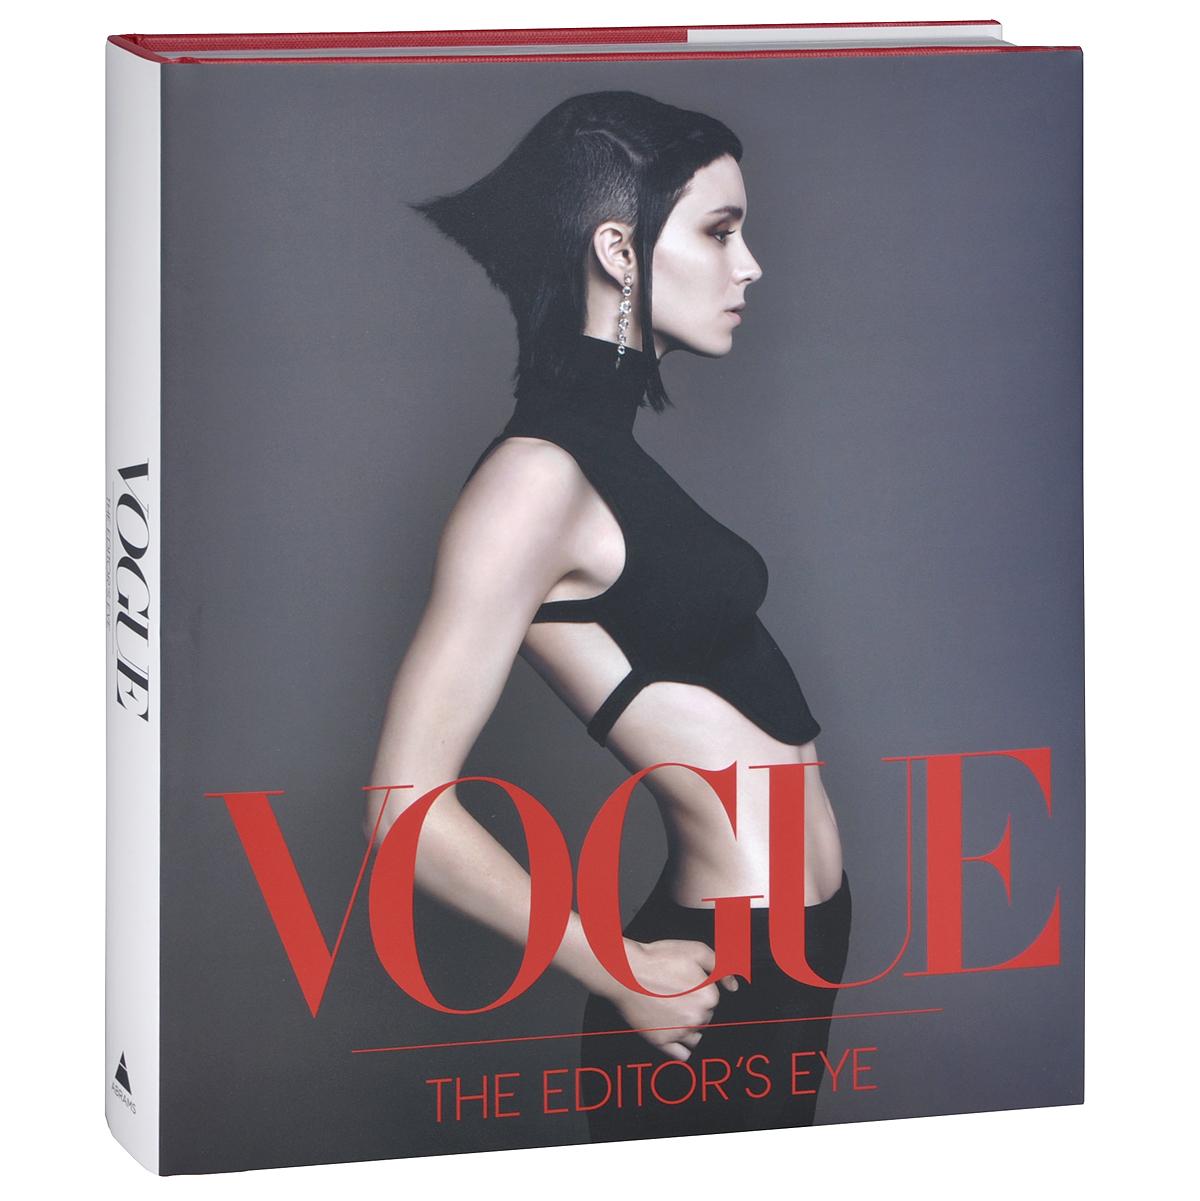 Vogue: The Editor's Eye vogue on hubert de givenchy